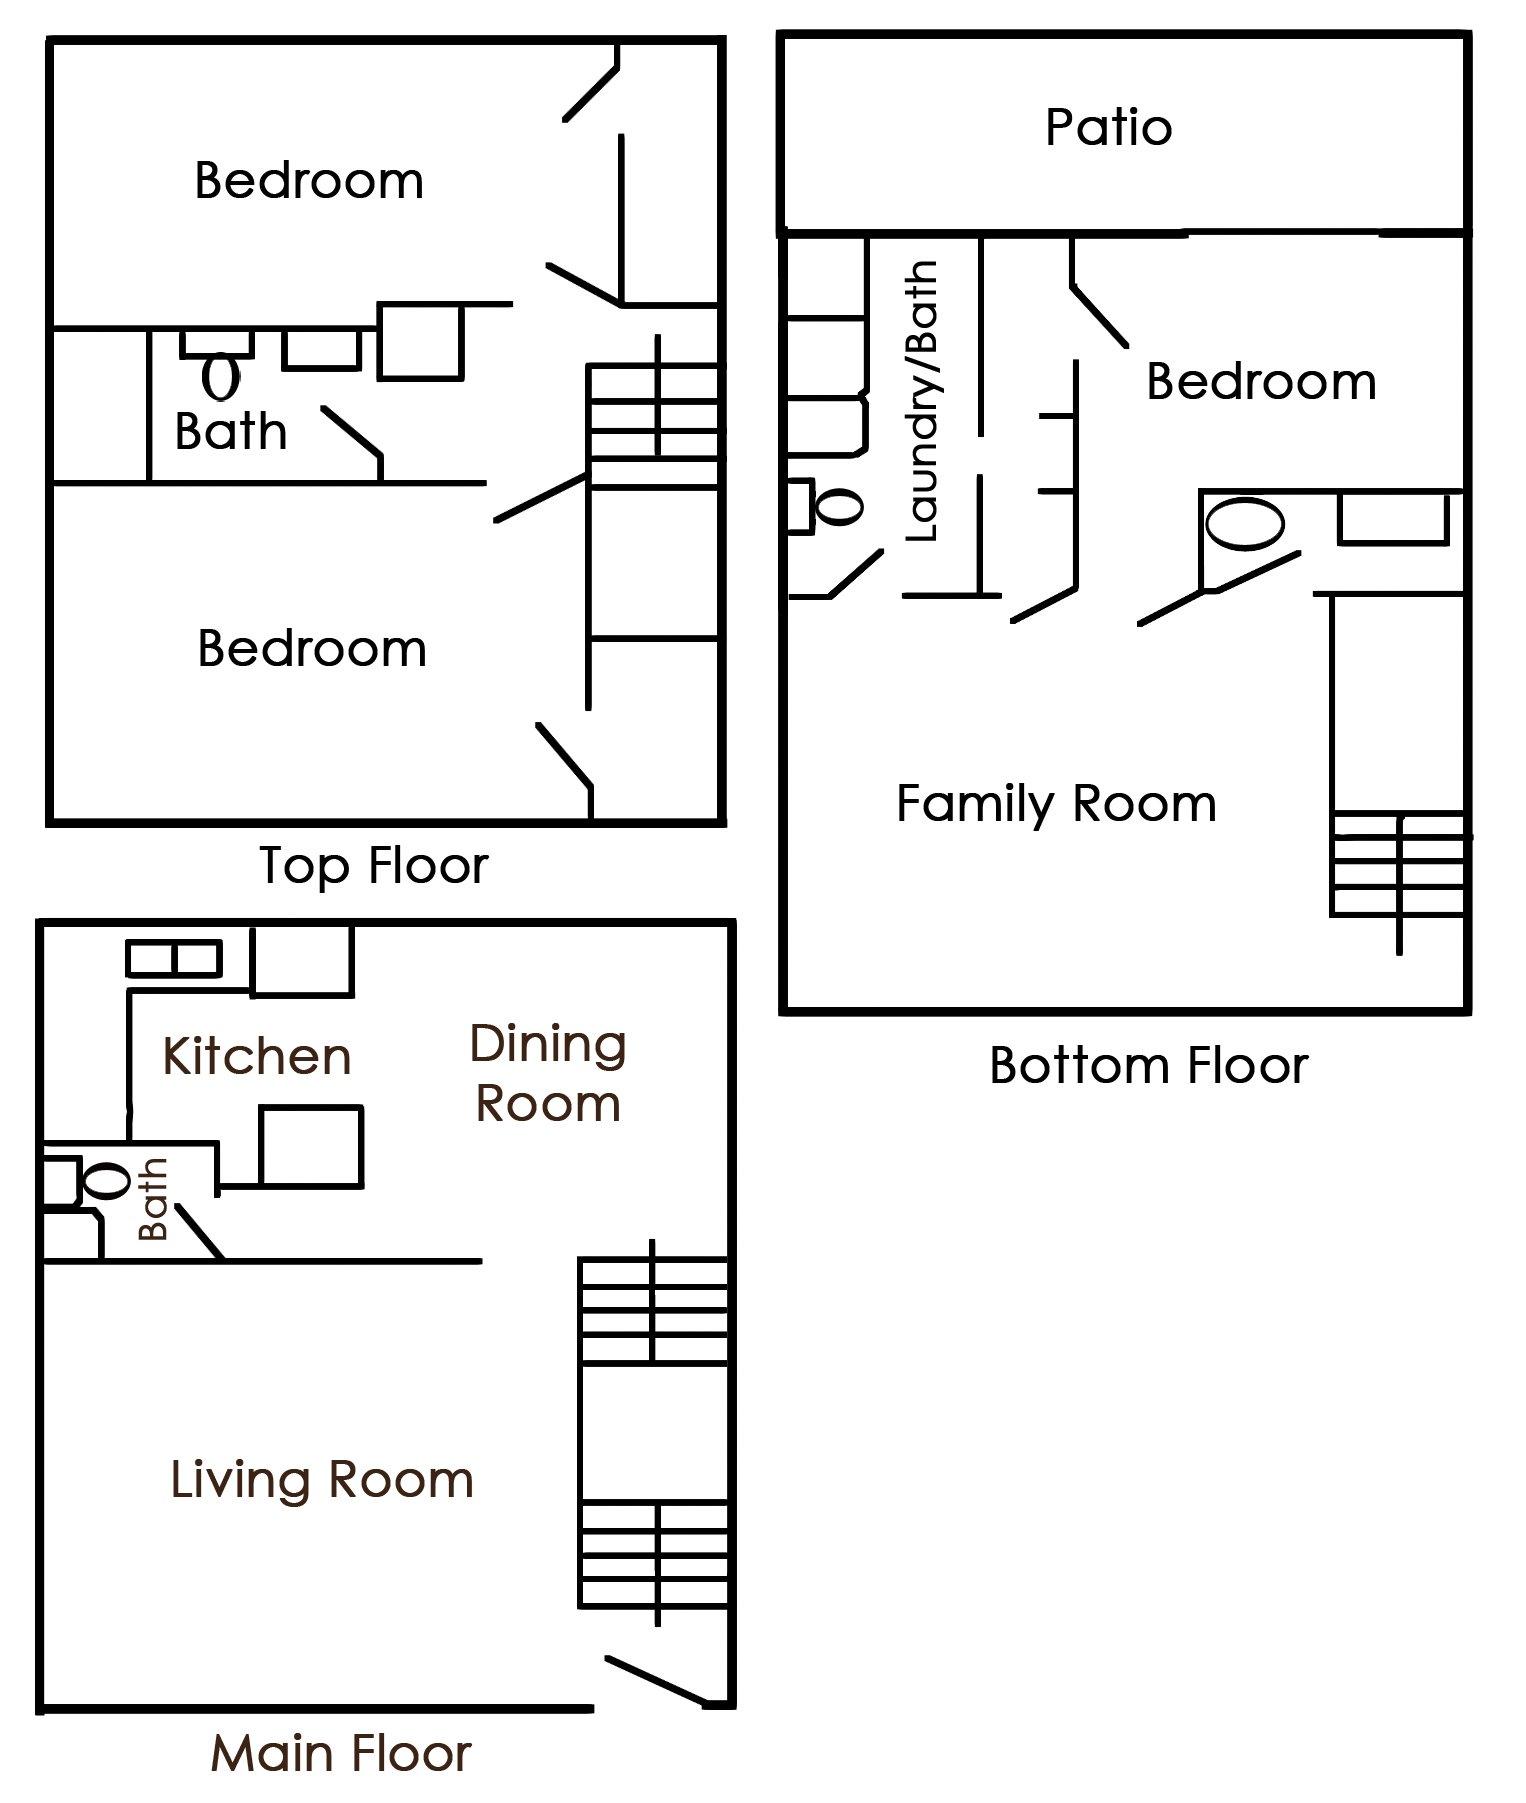 Townhomes at Mountain Ridge Apartments Floor Plan 3 Bedroom 2.5 Bath